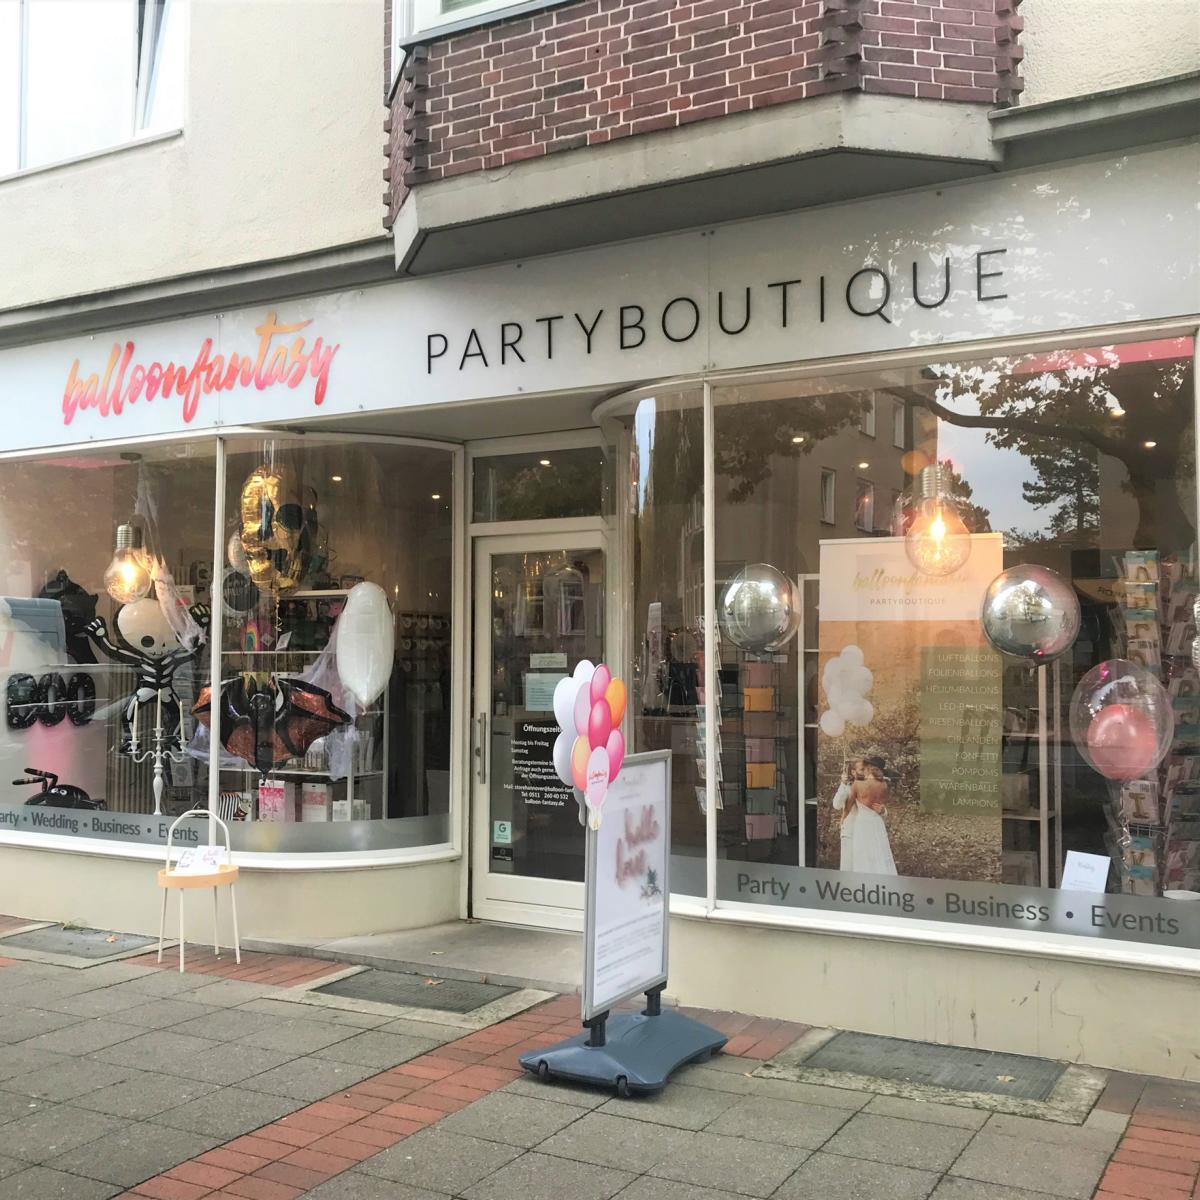 style hannover balloonfantasy hannover 1 - BALLOON FANTASY - charmante Partyboutique